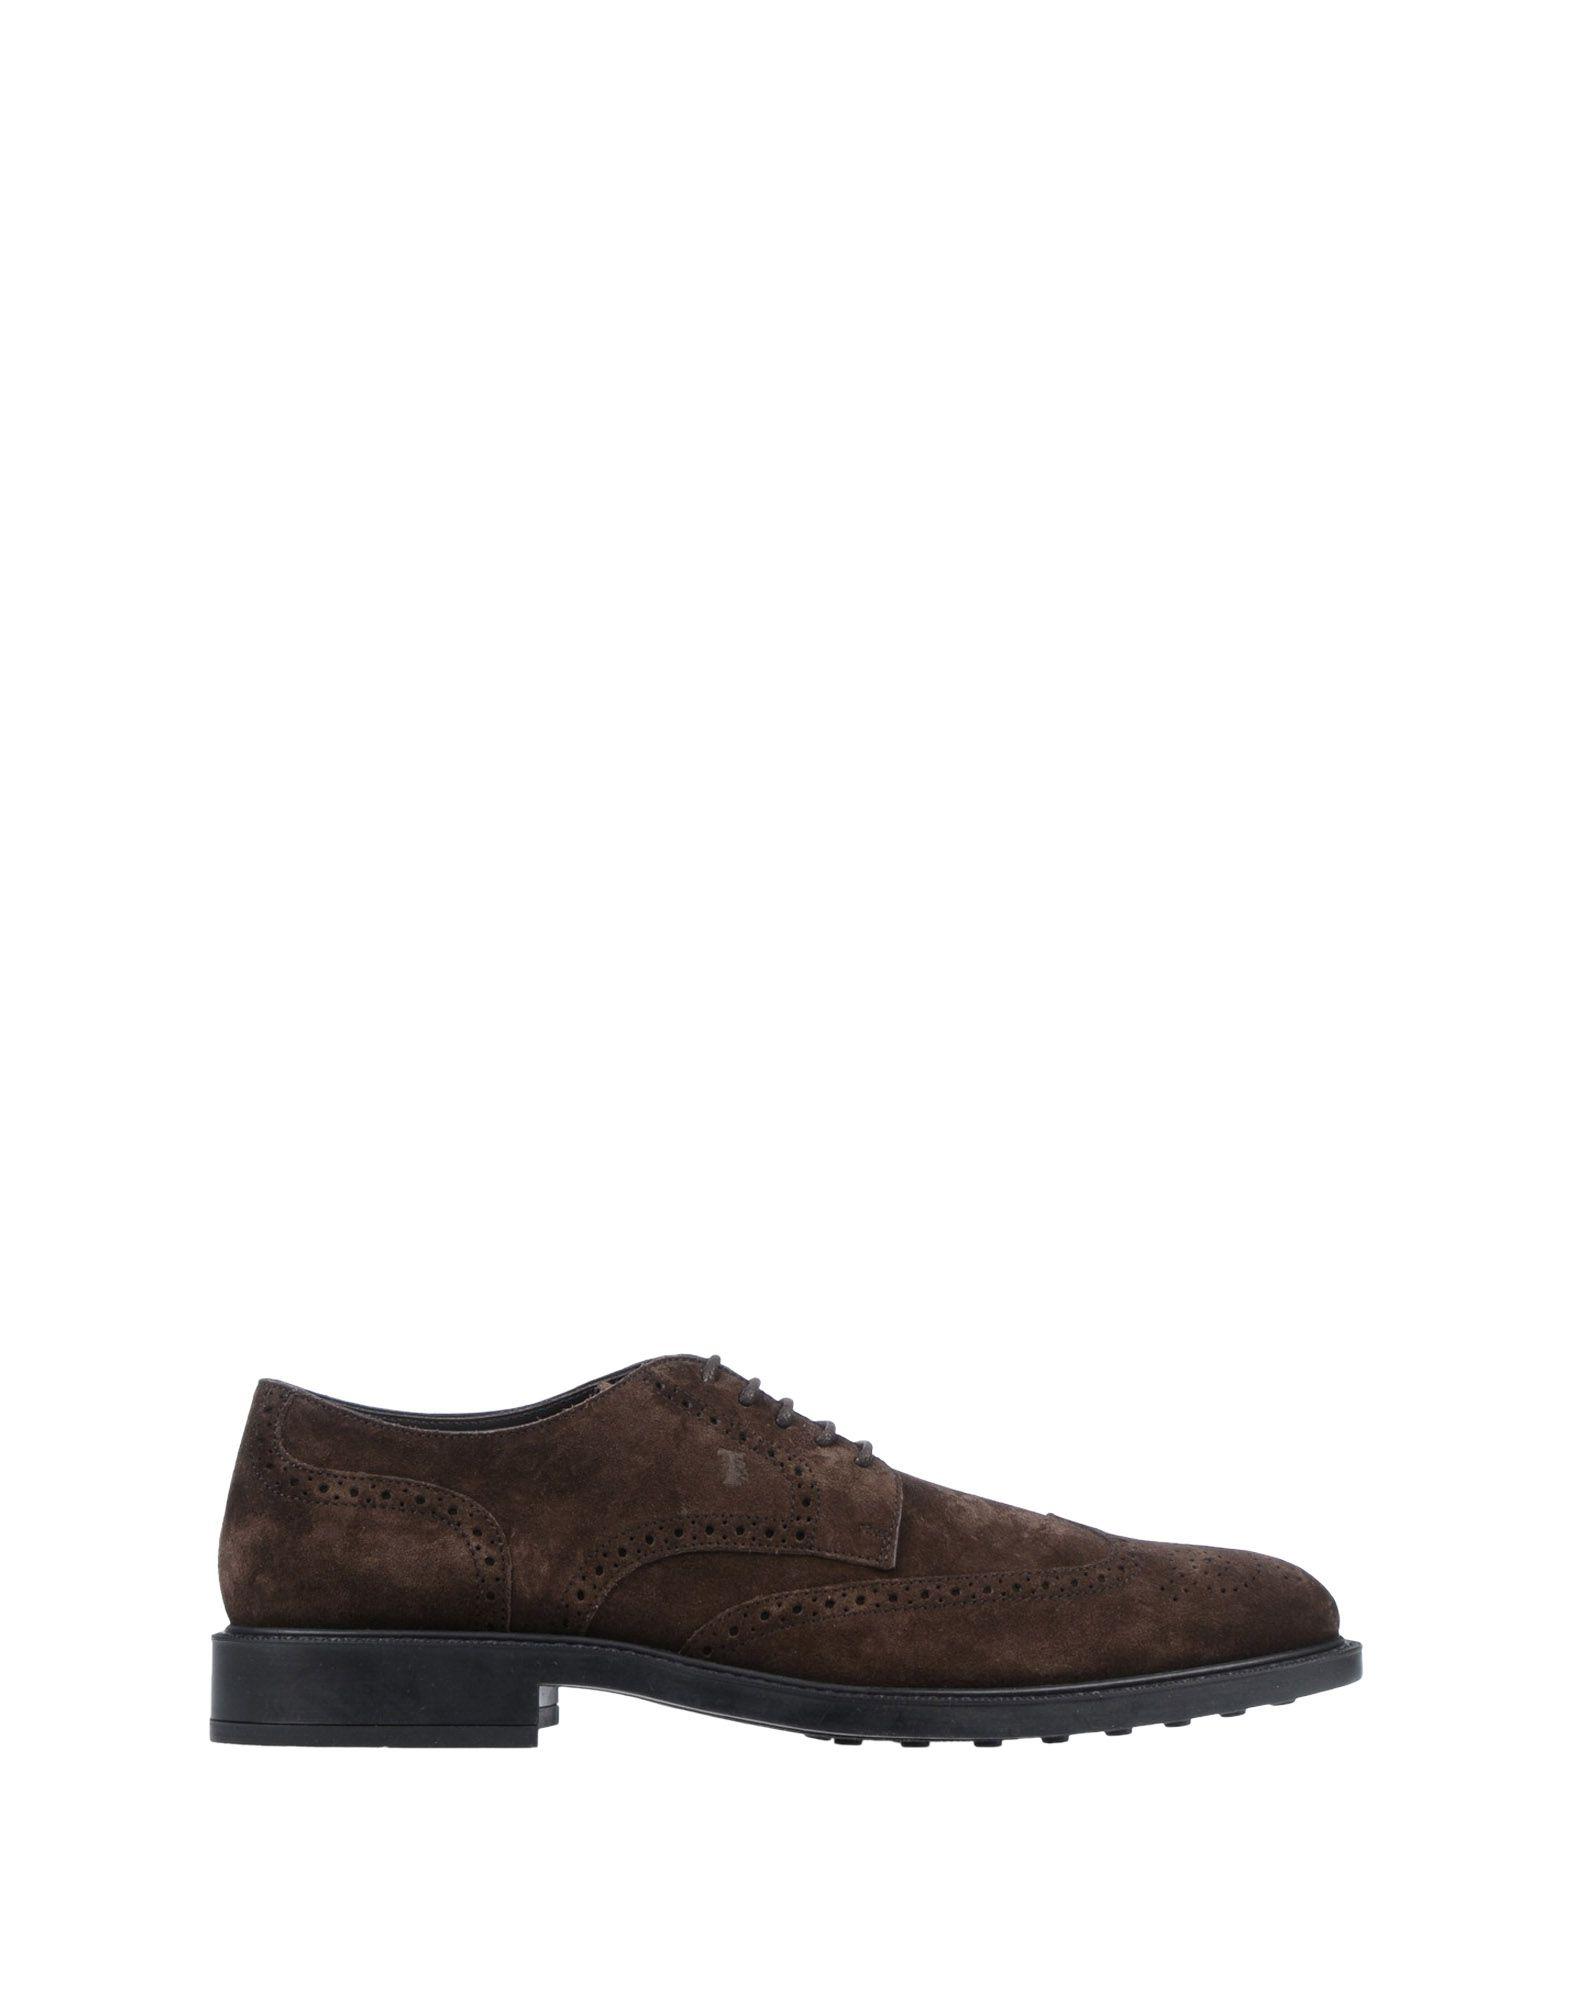 Tod's Schnürschuhe Herren  11508061NB Gute Qualität beliebte Schuhe